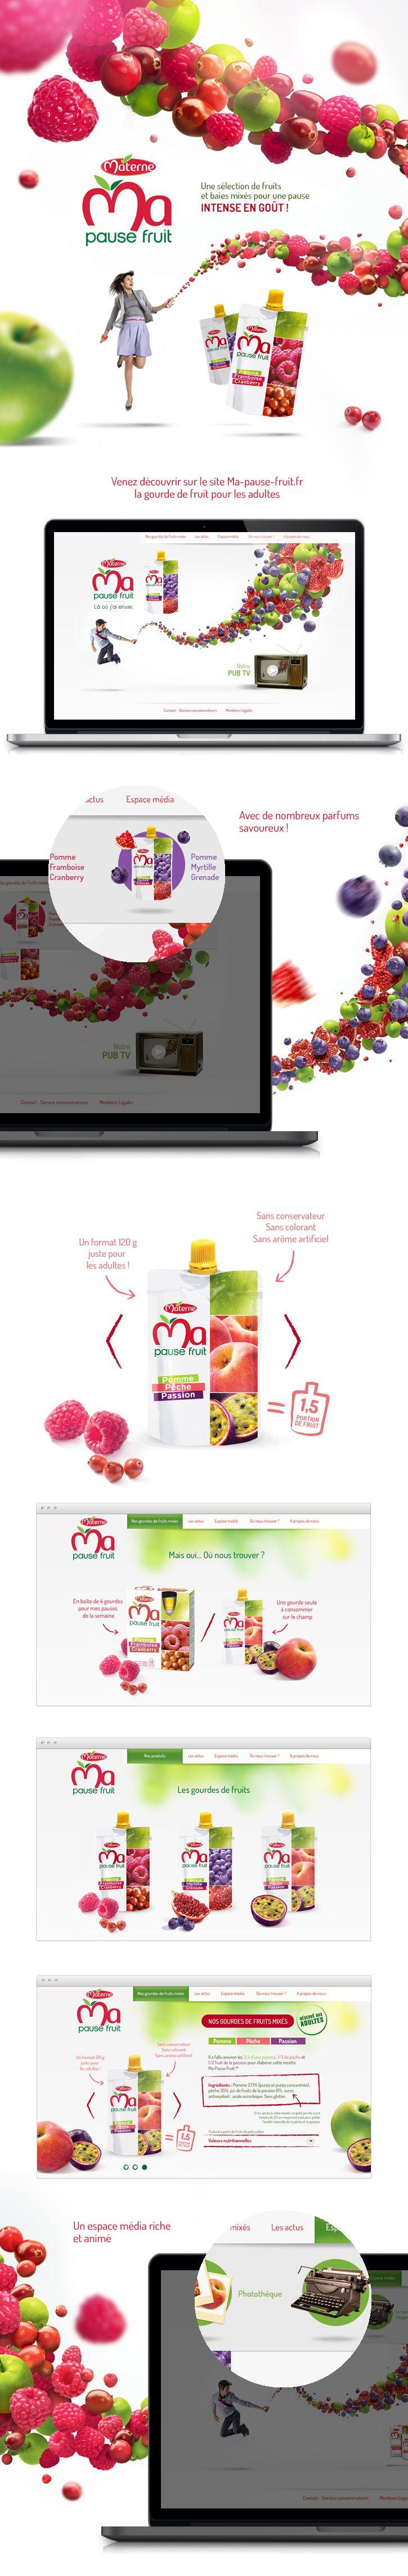 http://www.webdesignserved.com/gallery/Webdesign-Ma-pause-fruit/9526309